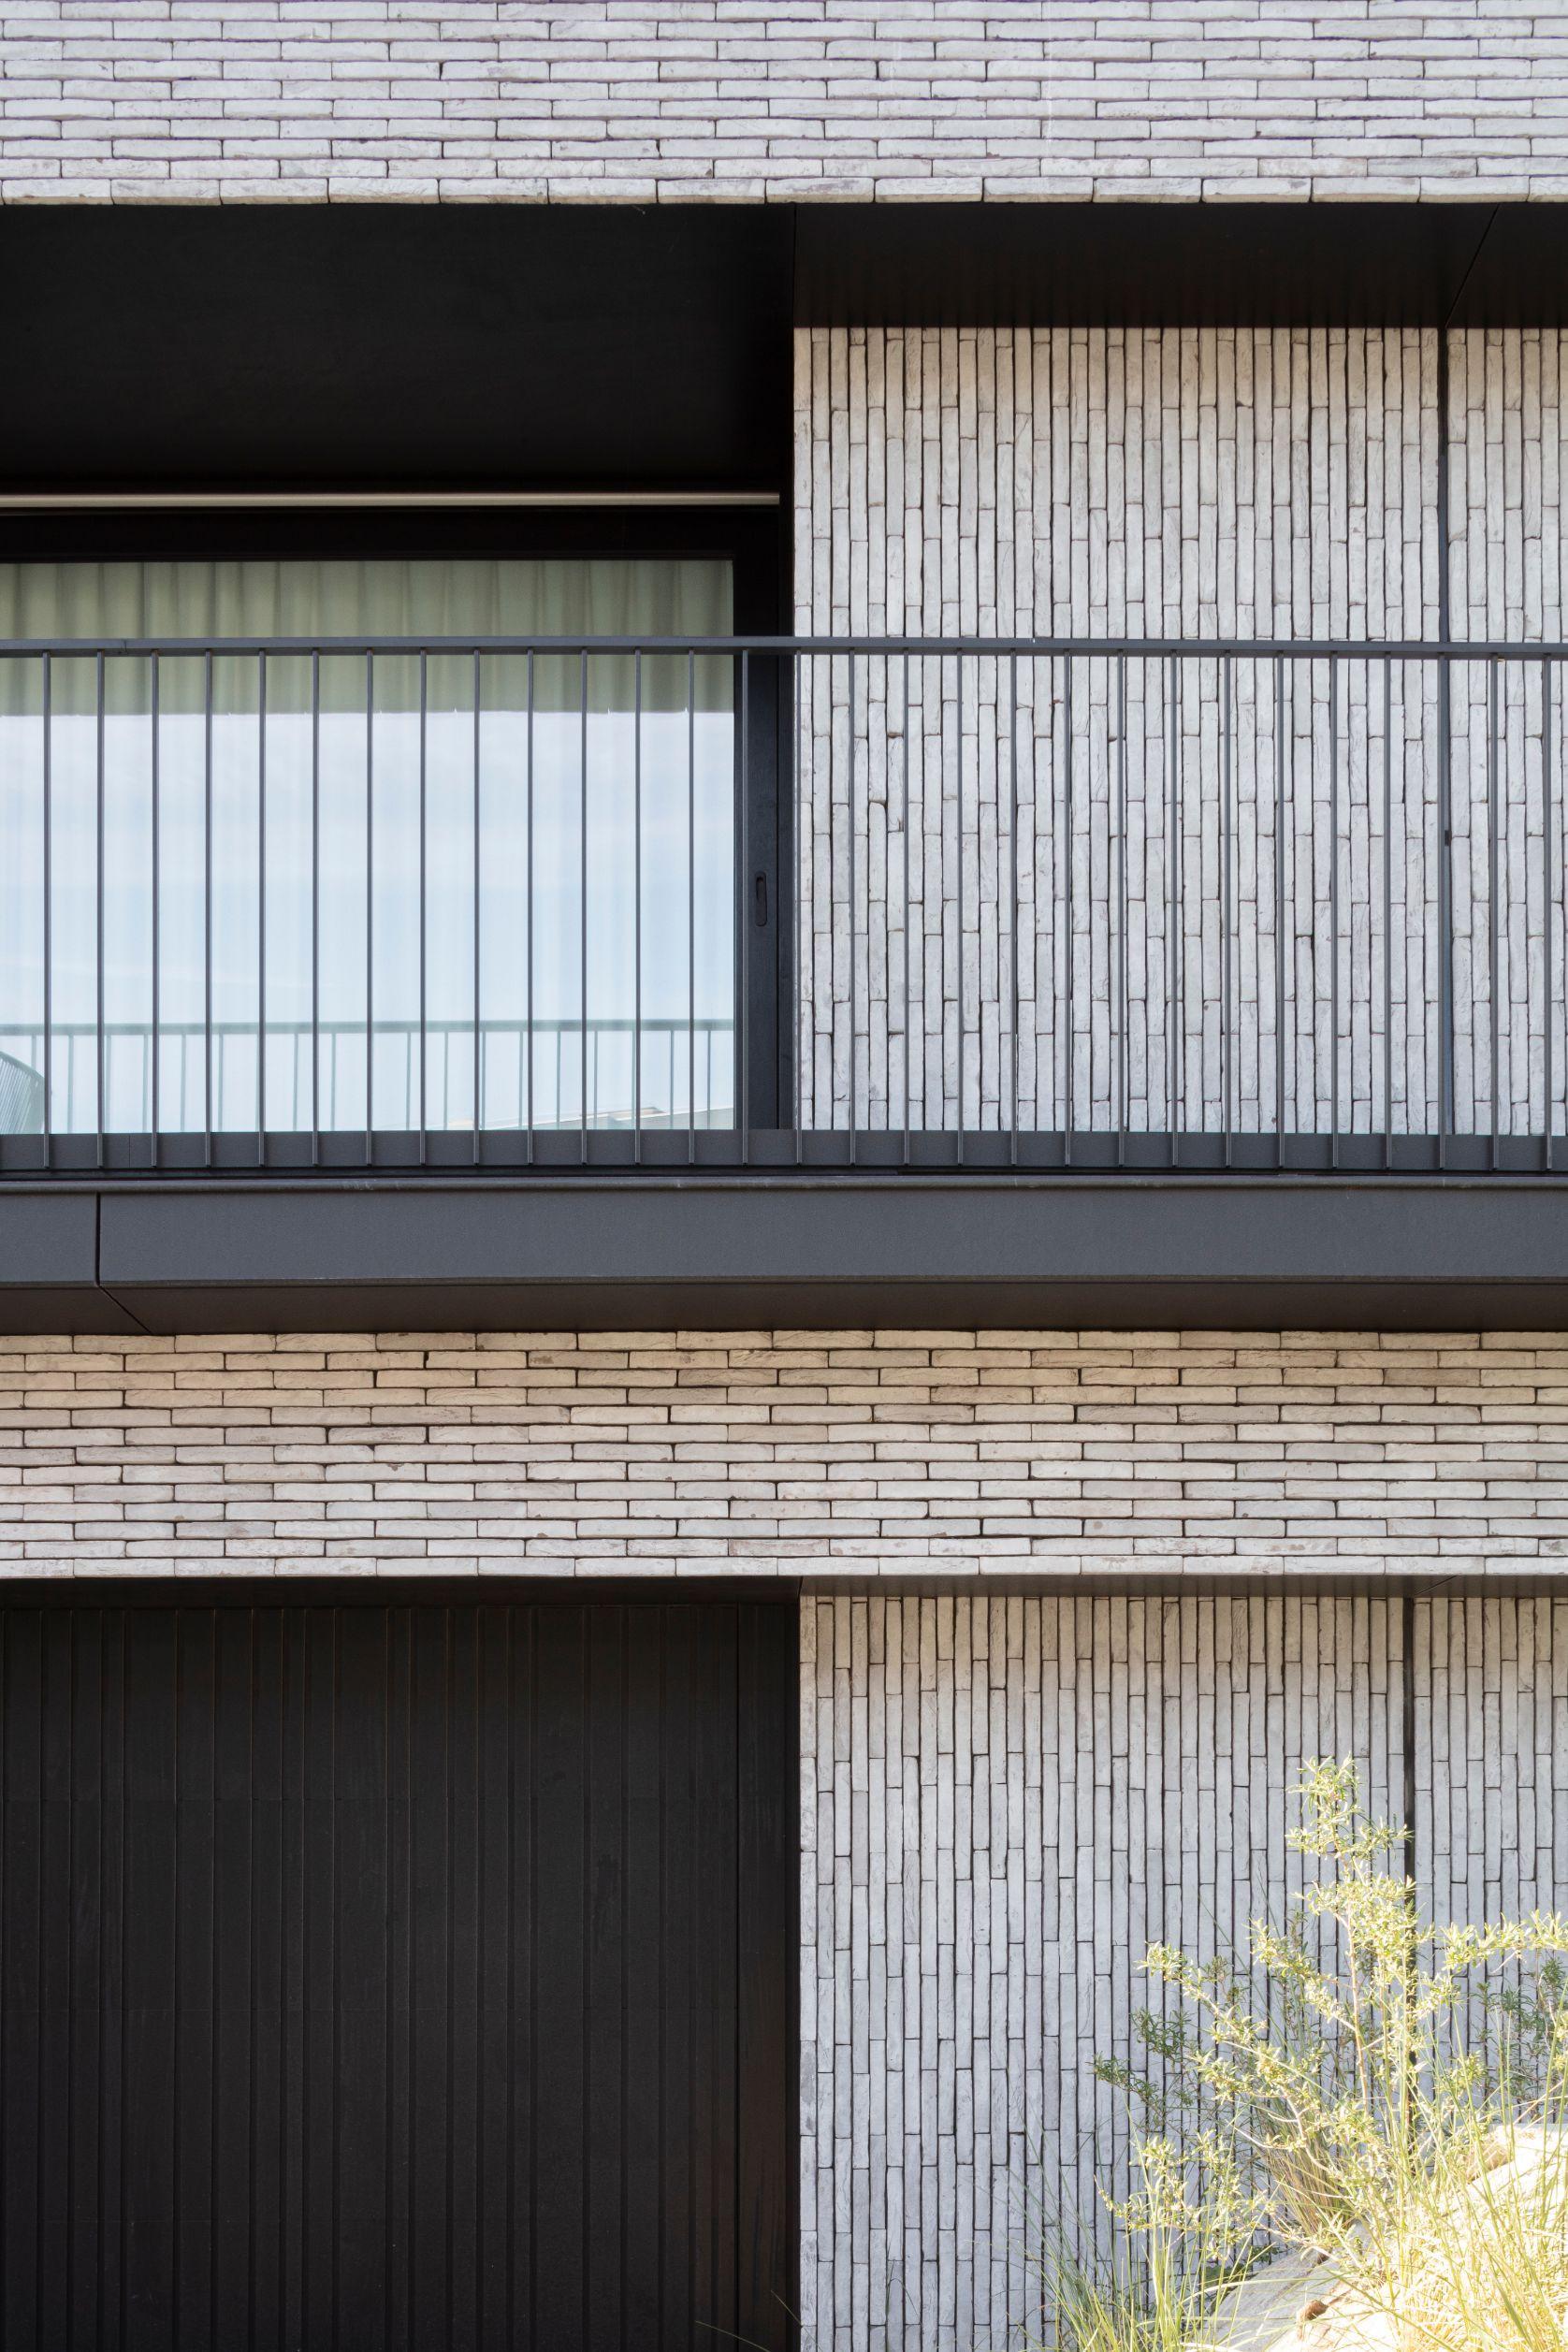 Pierre Paulin - Rietveldprojects - Sint-Idesbald - Tvdv2